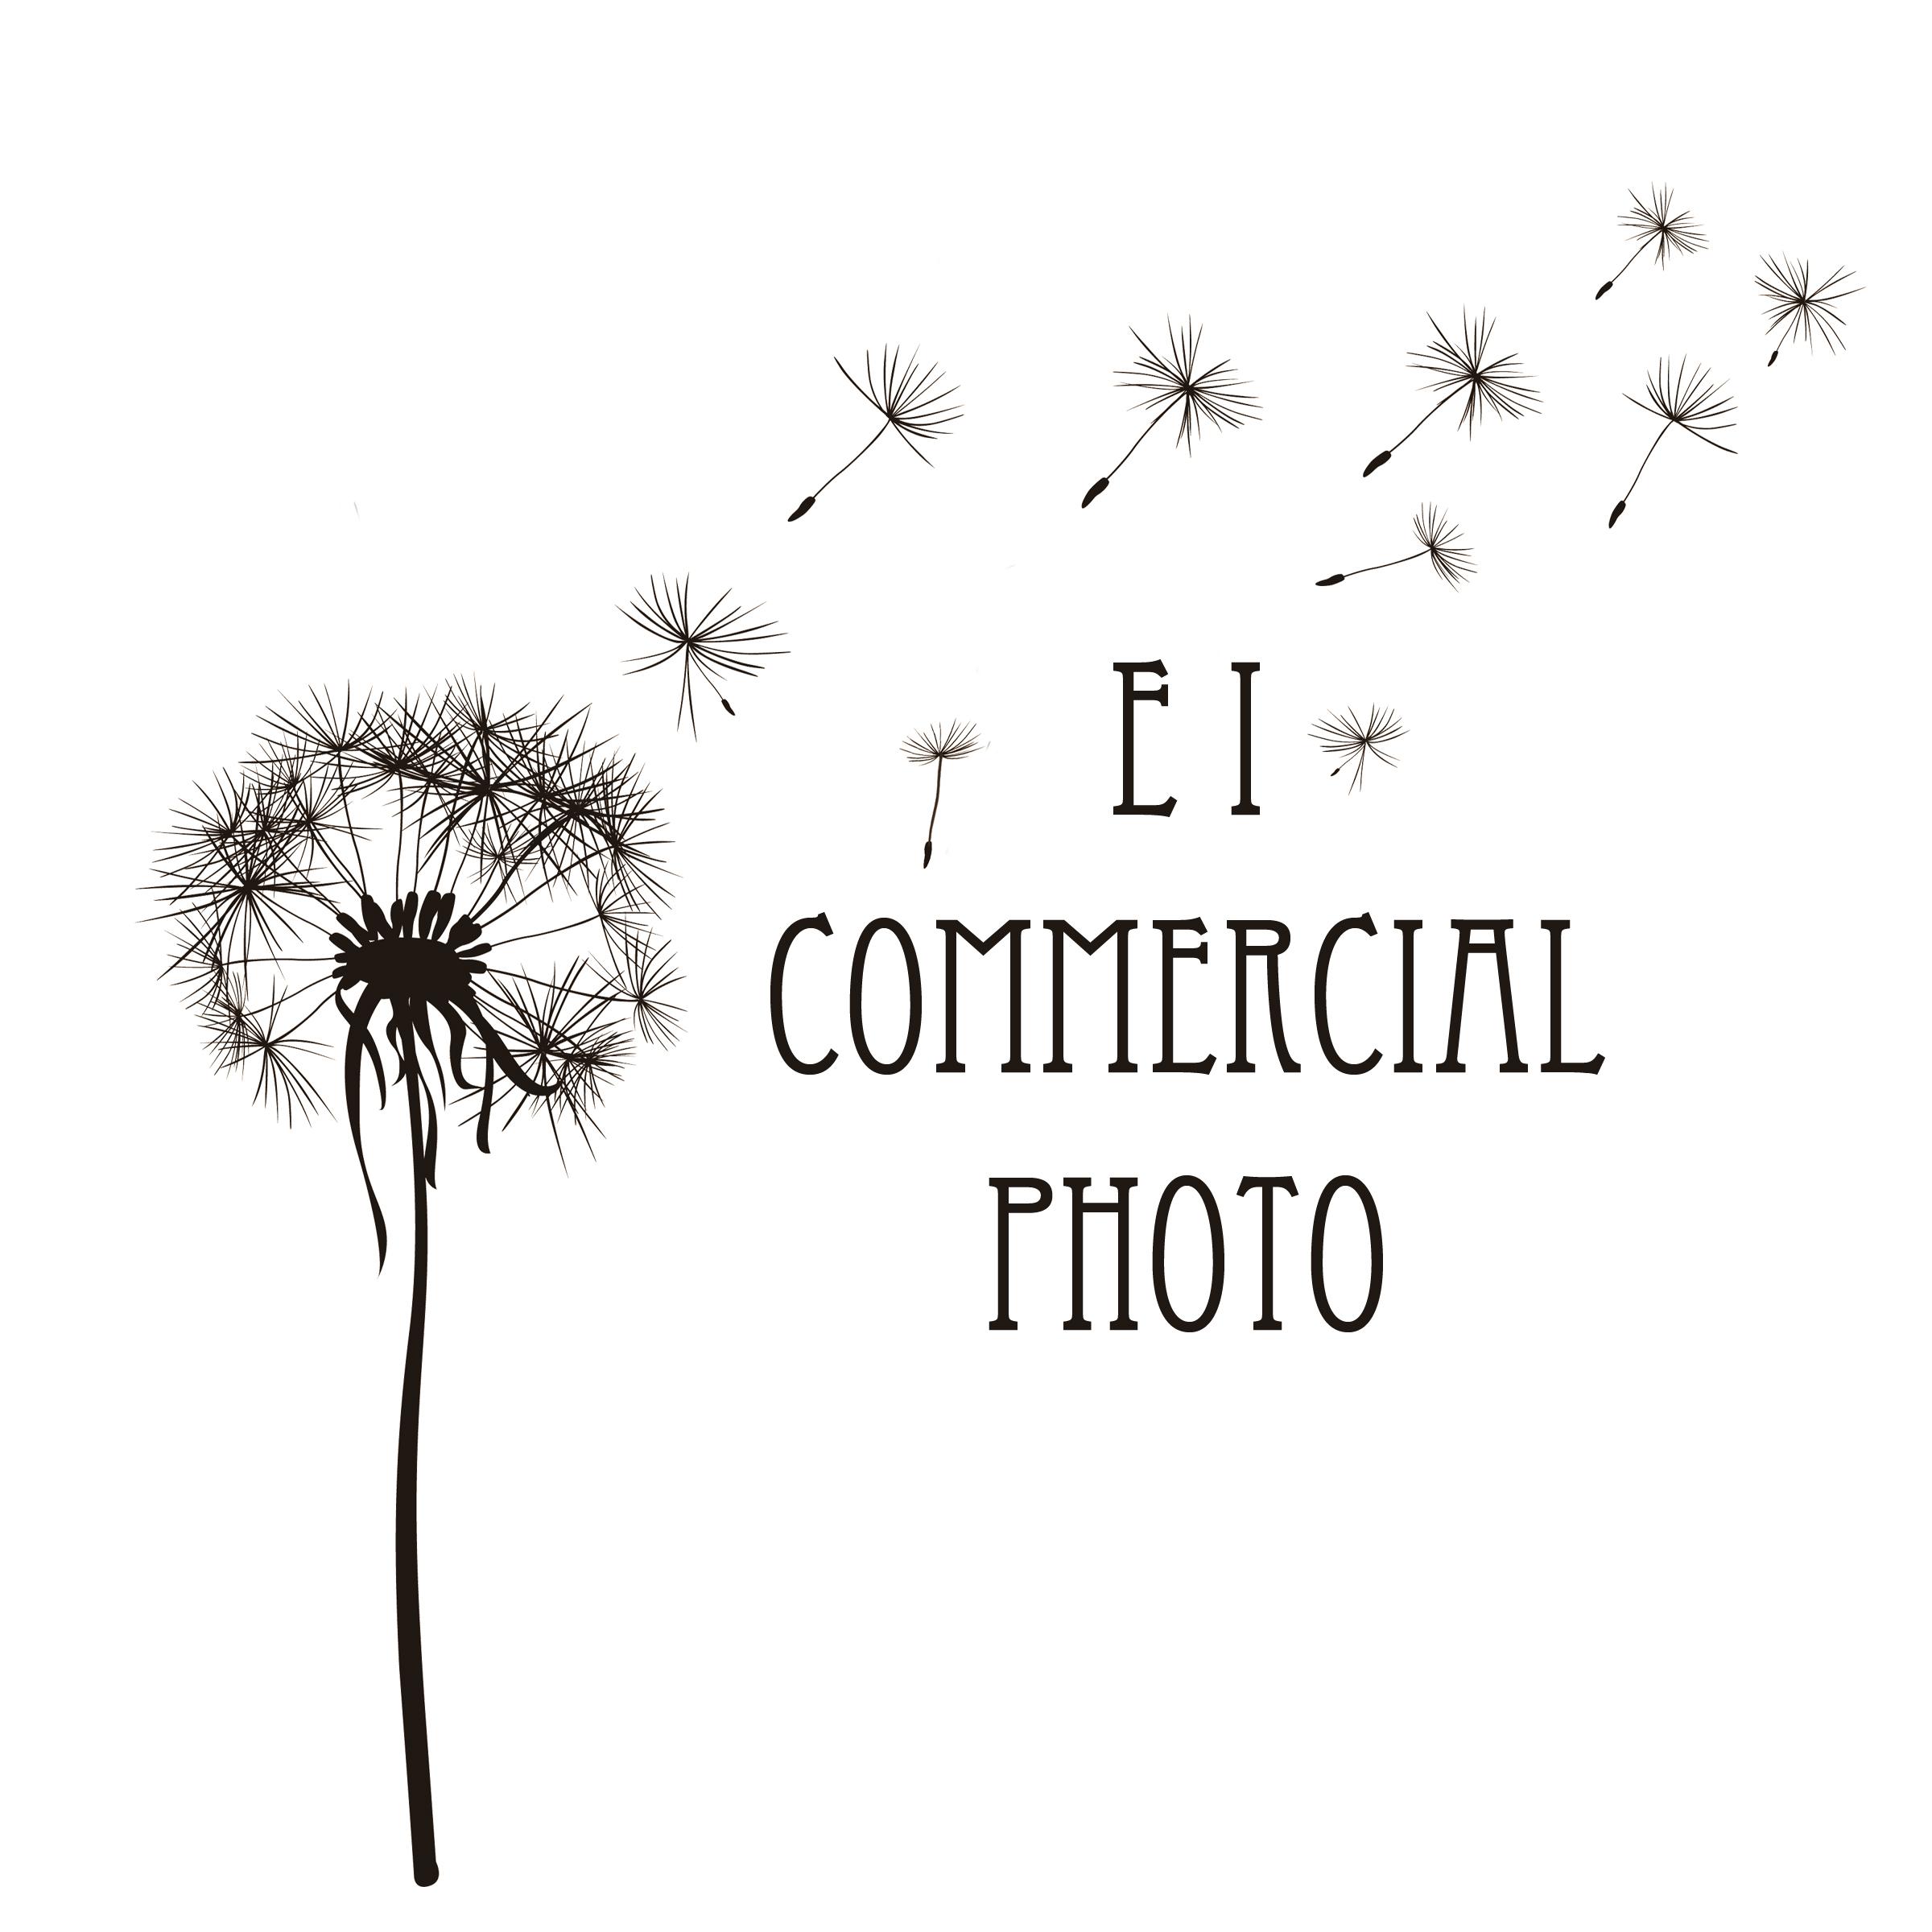 EI Commercial Photo